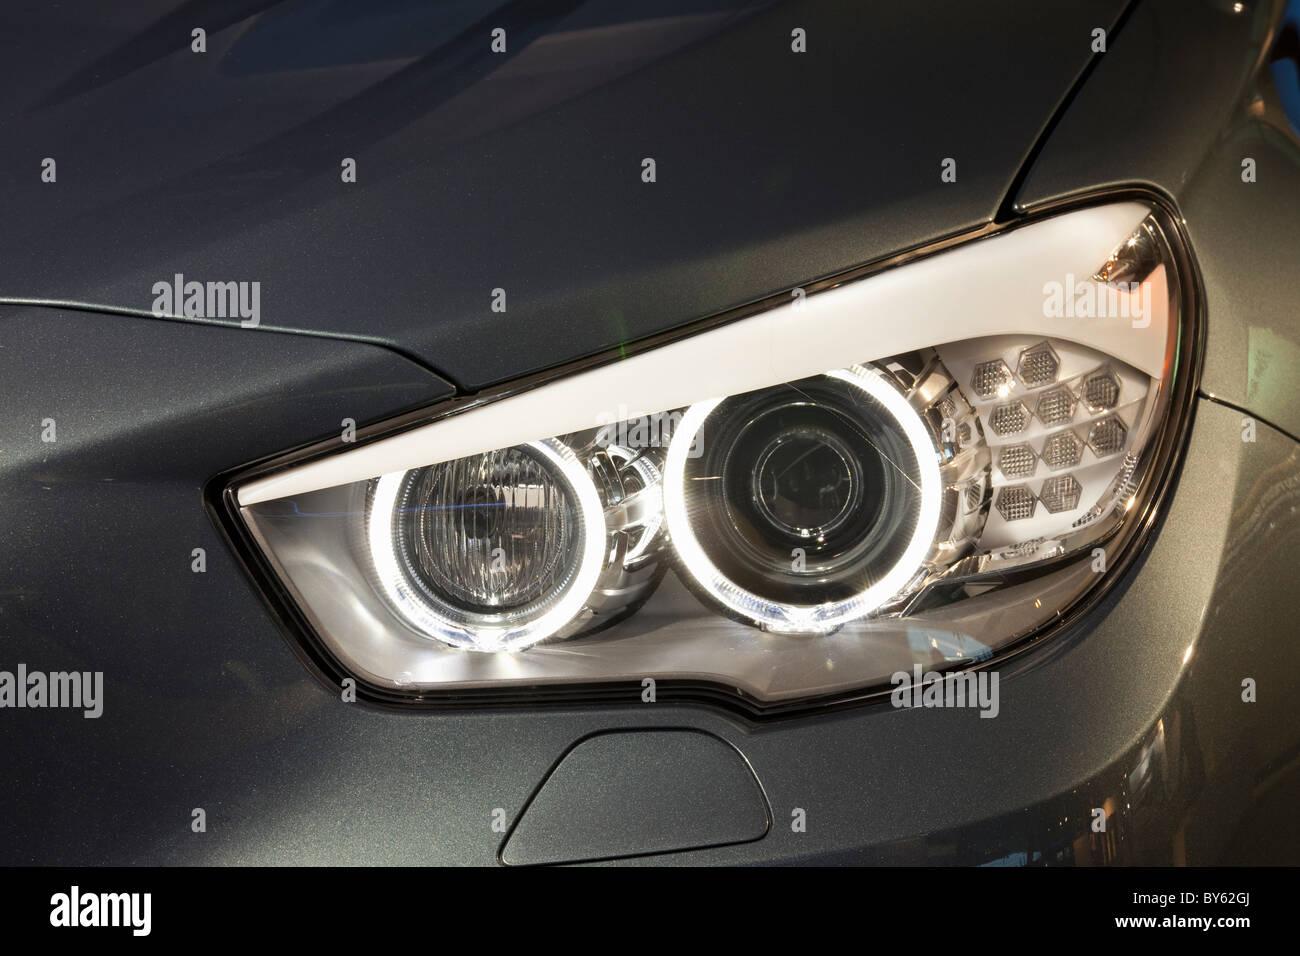 LED headlights on a BMW car - Stock Image